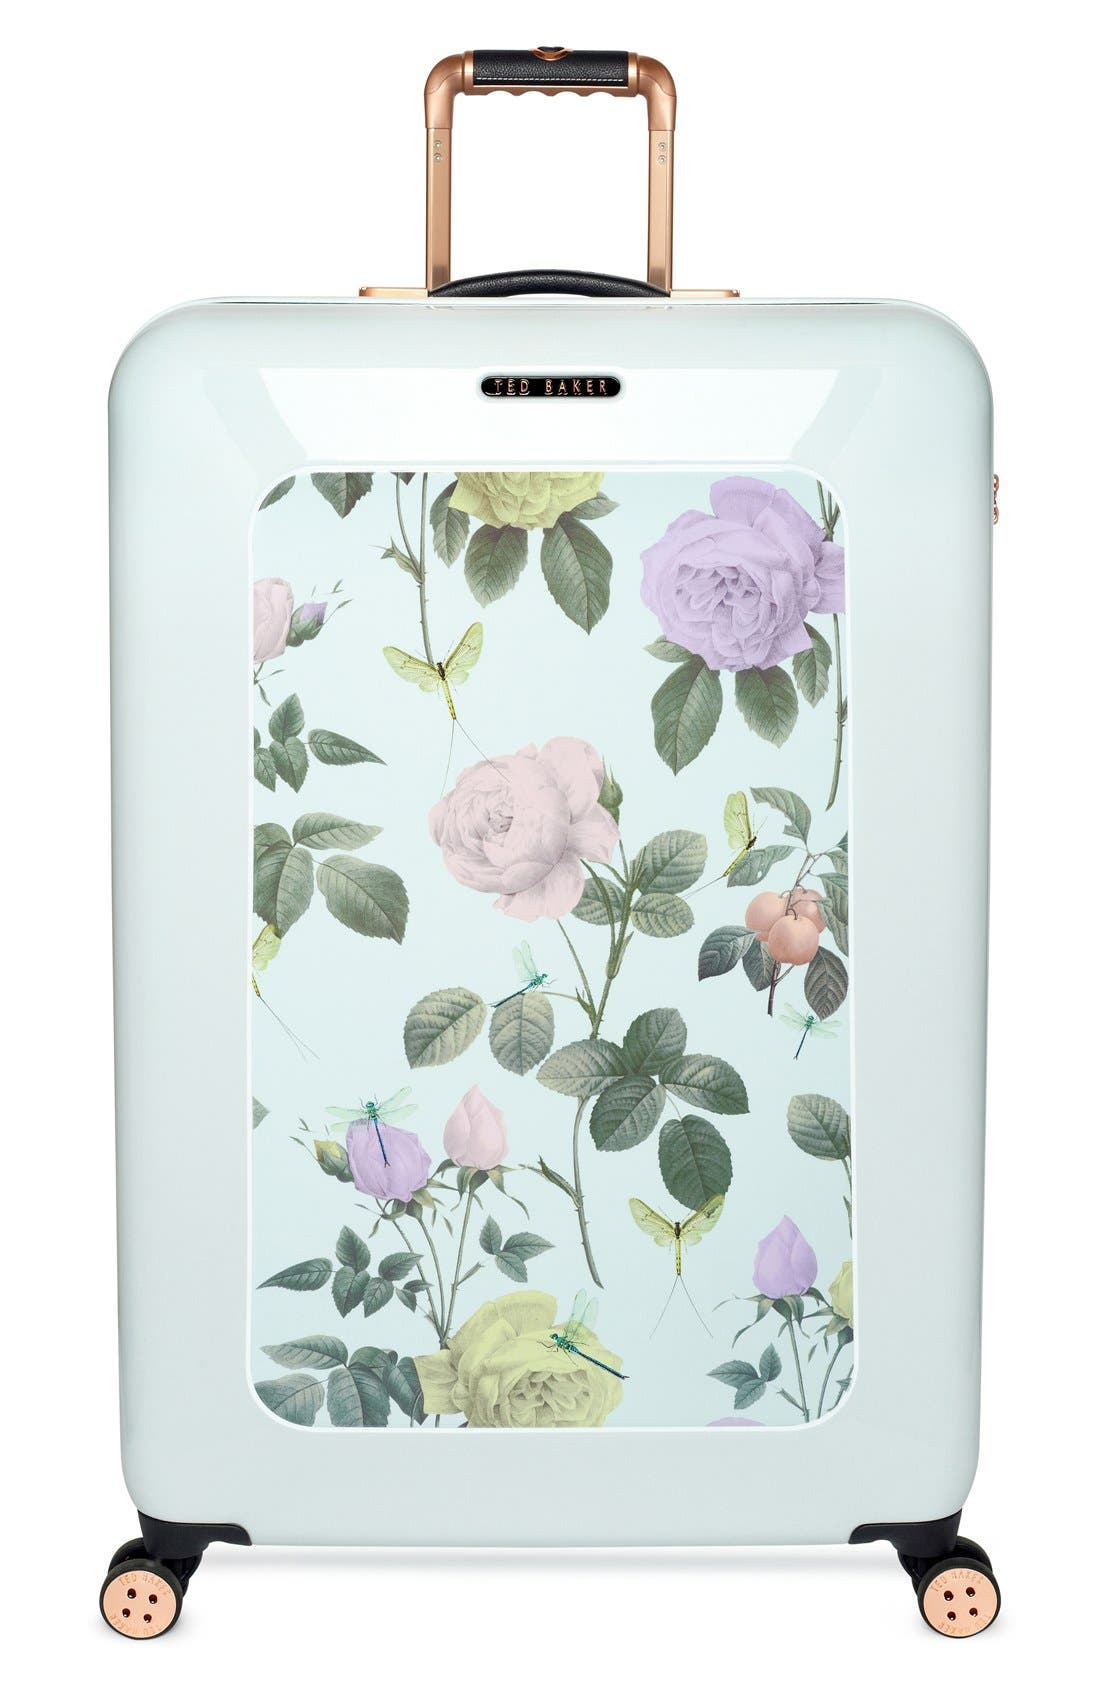 Alternate Image 1 Selected - Ted Baker London 'Large Rose' Hard Shell Suitcase (32 Inch)